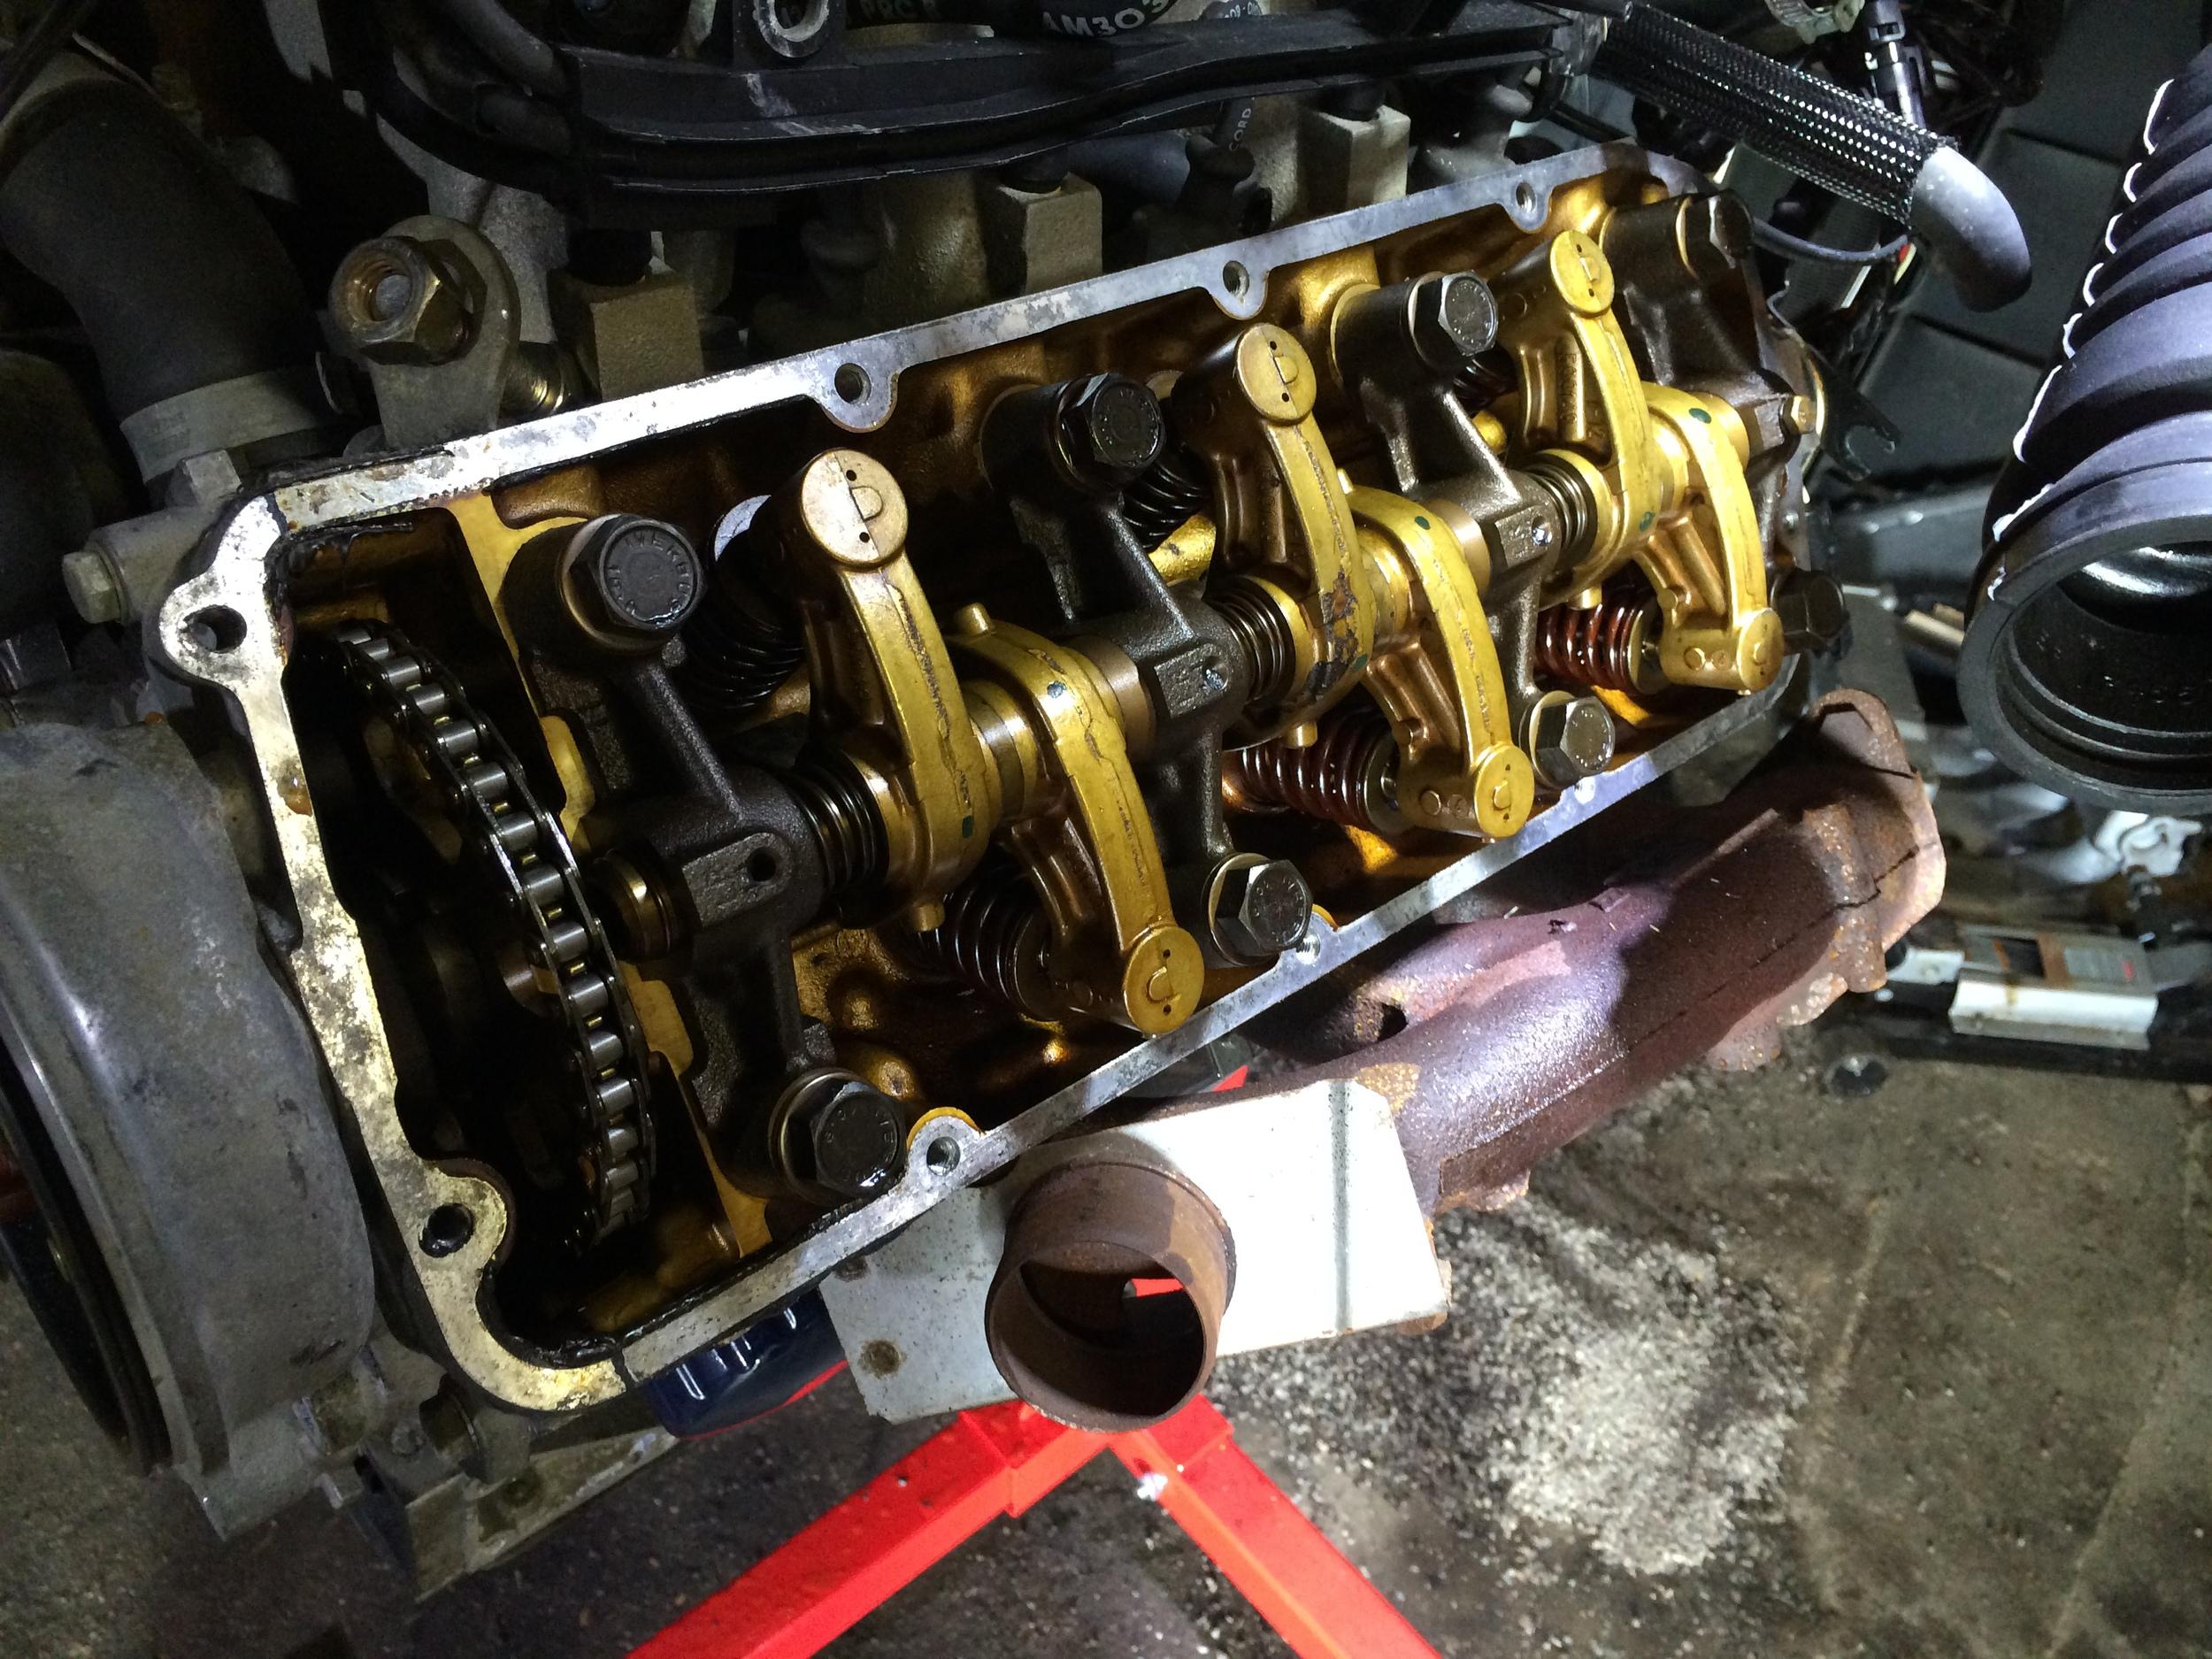 The valve train under the passenger side cylinder head.